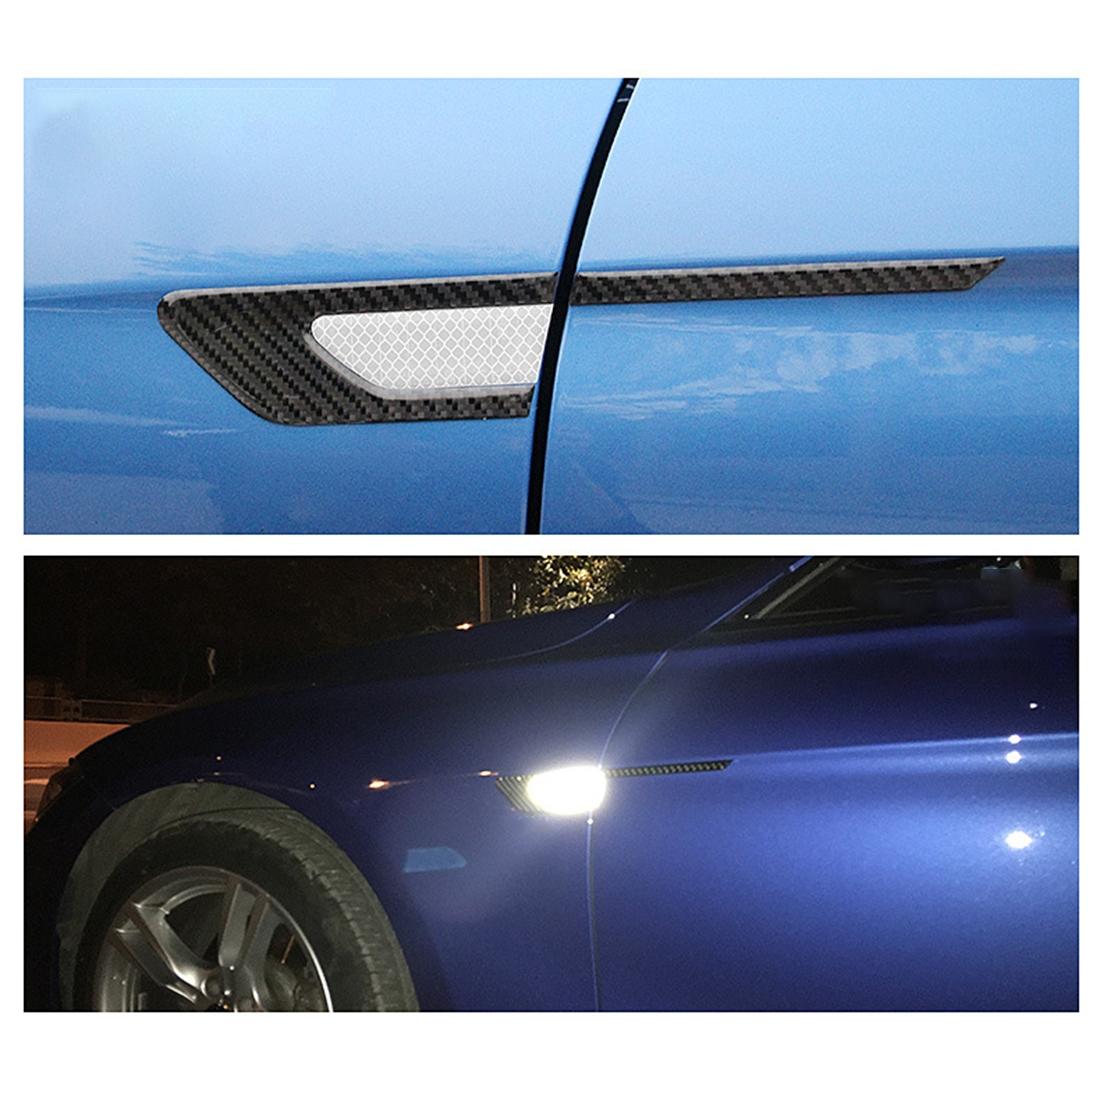 2 PCS Carbon Fiber Car-Styling Fender Reflective Bumper Decorative Strip, Inner Reflection + External Carbon Fiber (White)